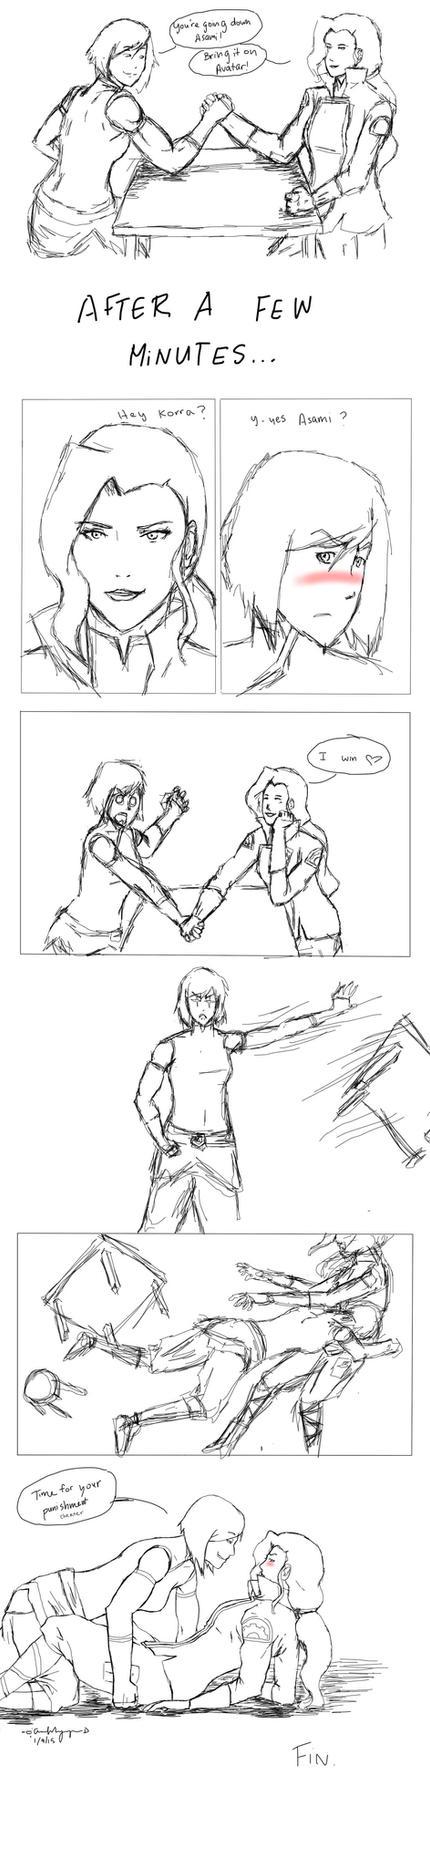 Arm Wrestling by anfu-yukiro